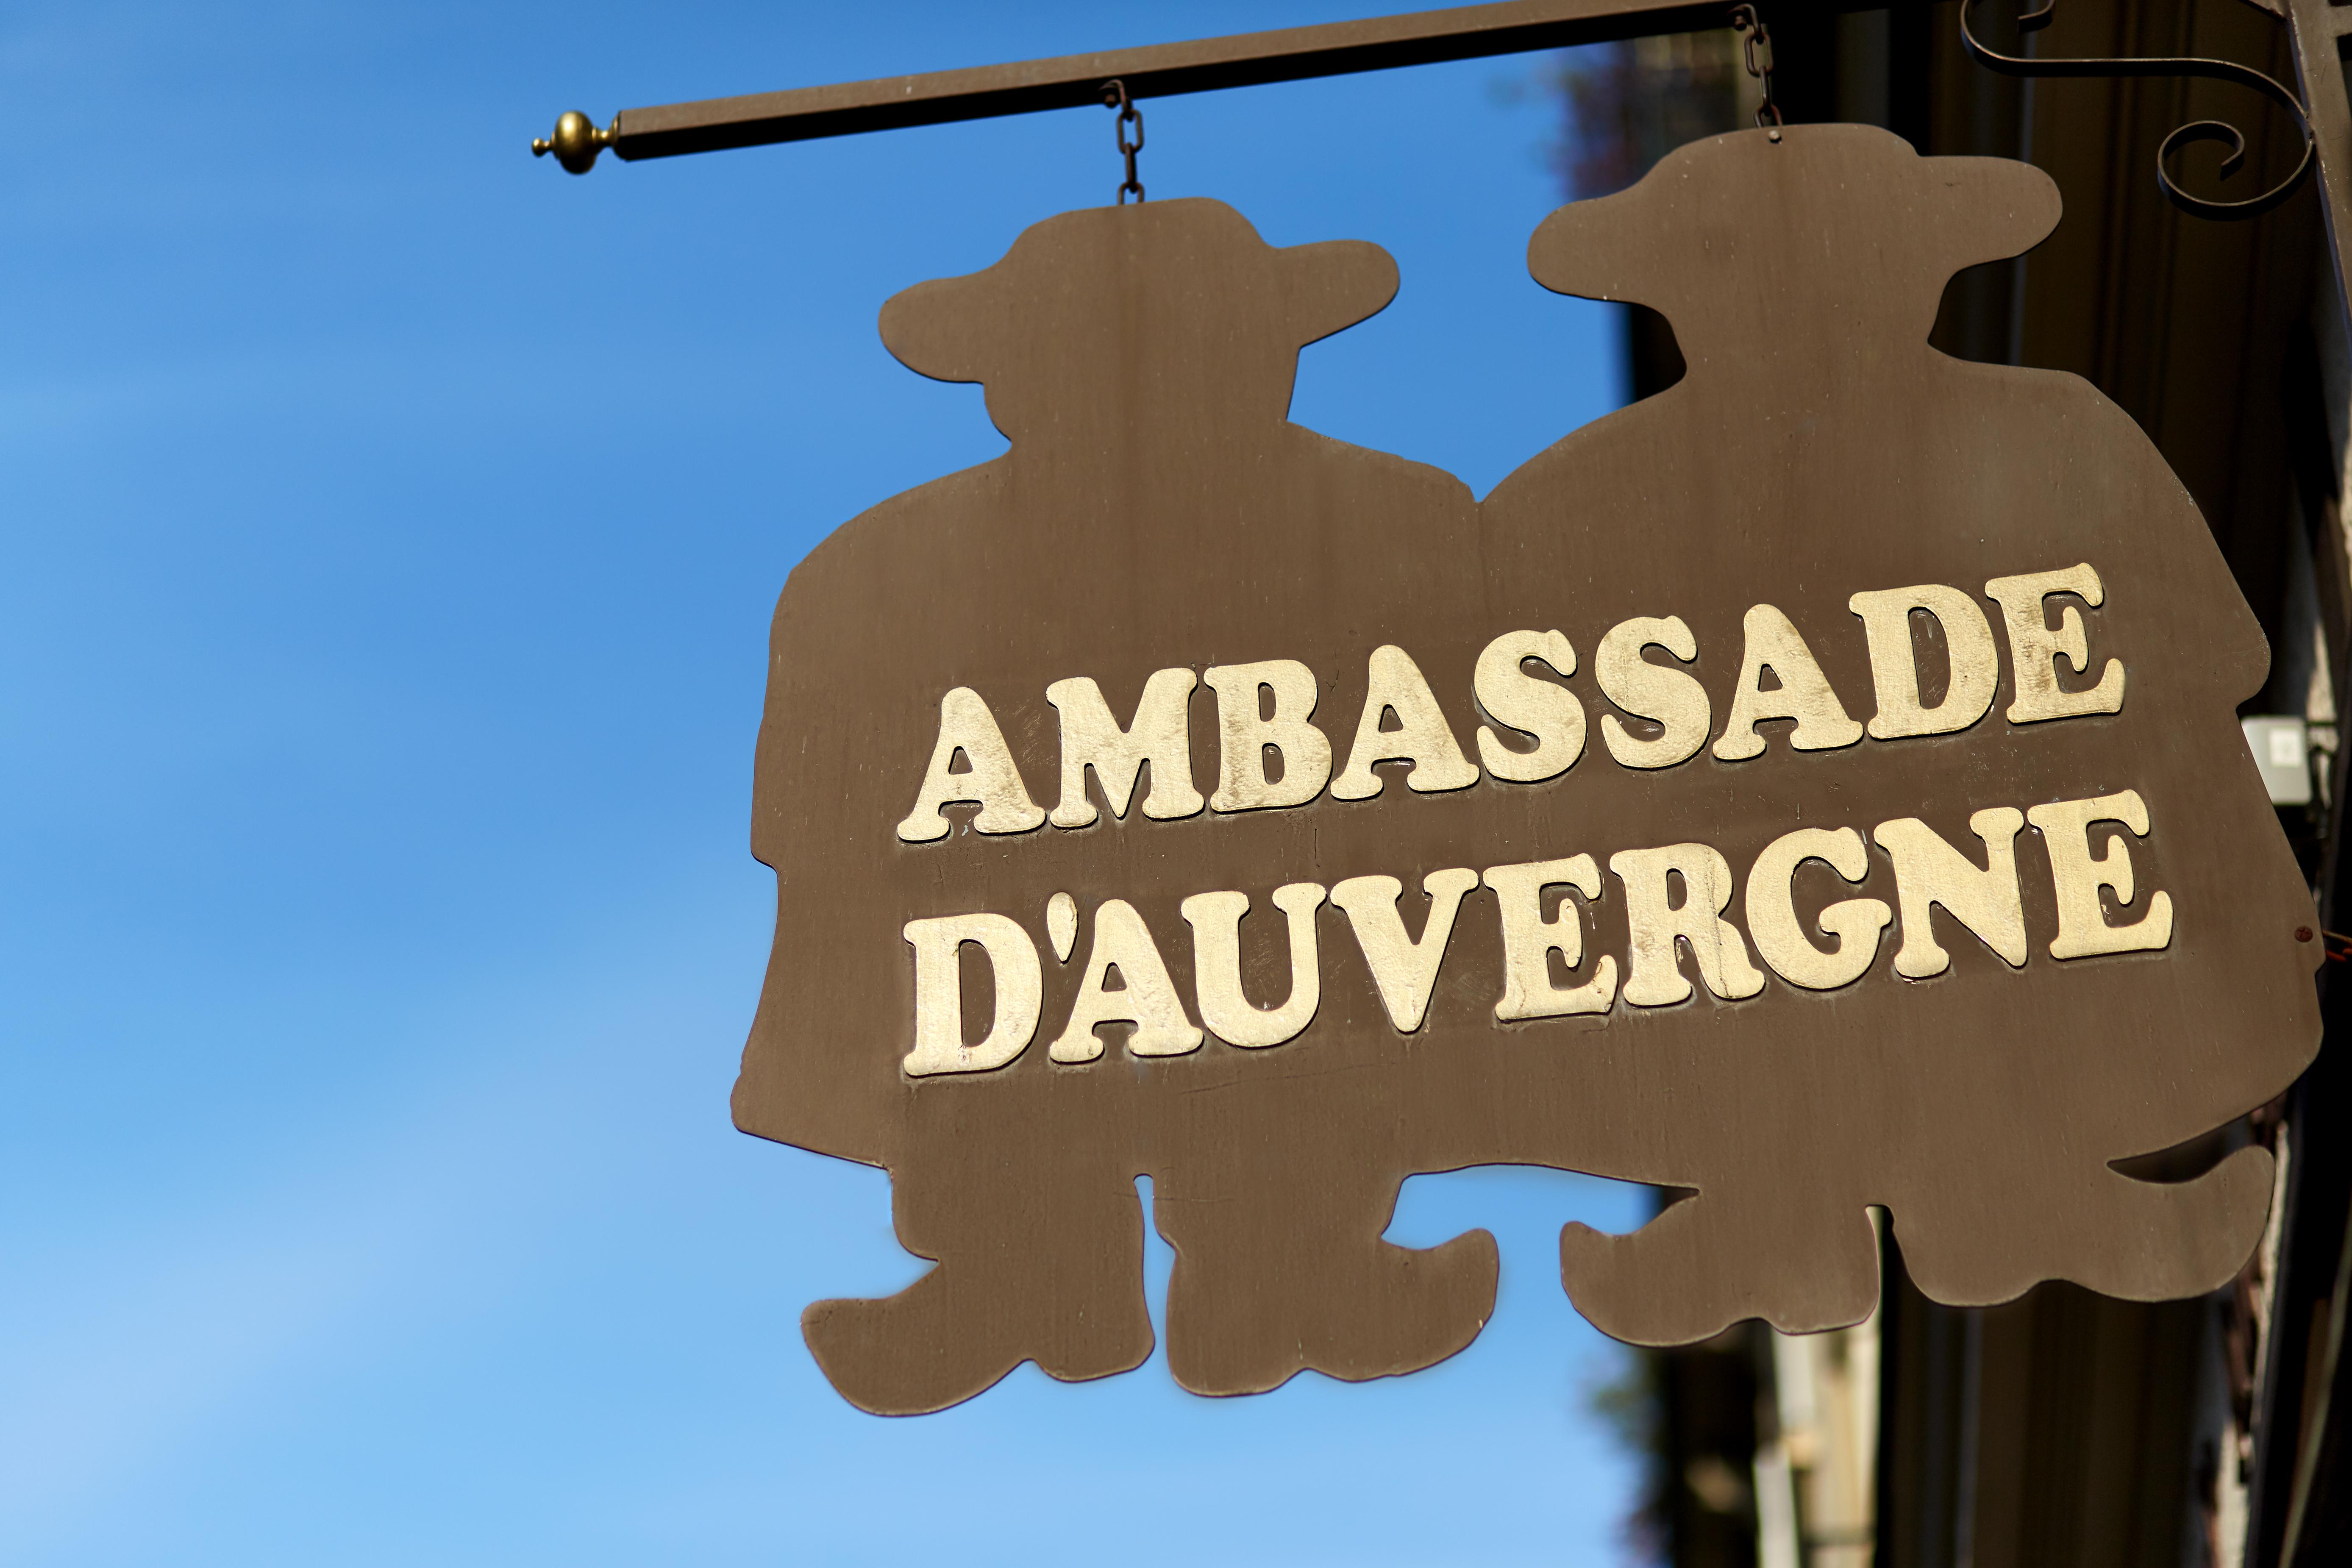 Adhérent L'AMBASSADE D'AUVERGNE - photo #8958